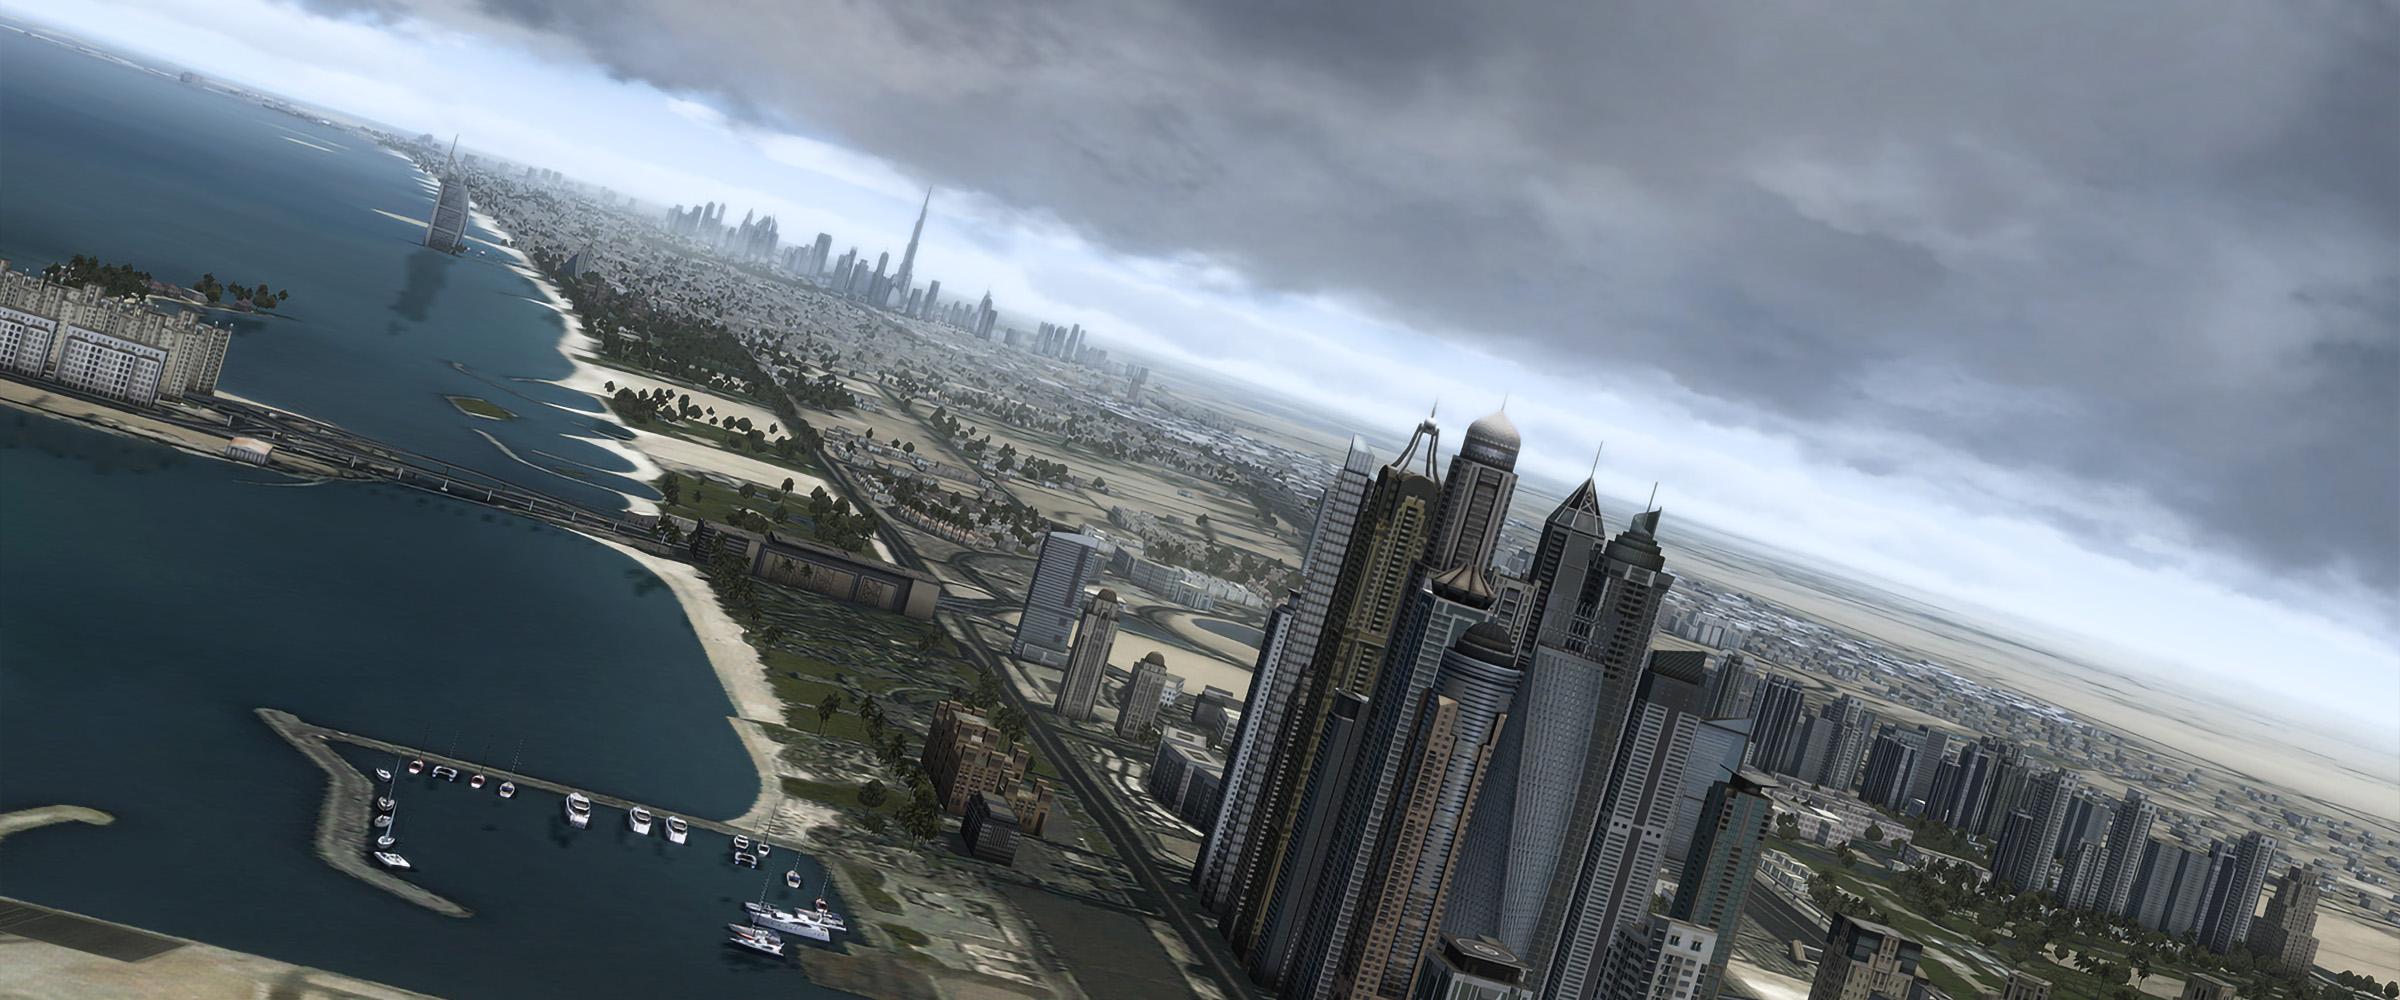 FlyTampa-Dubai Rebooted